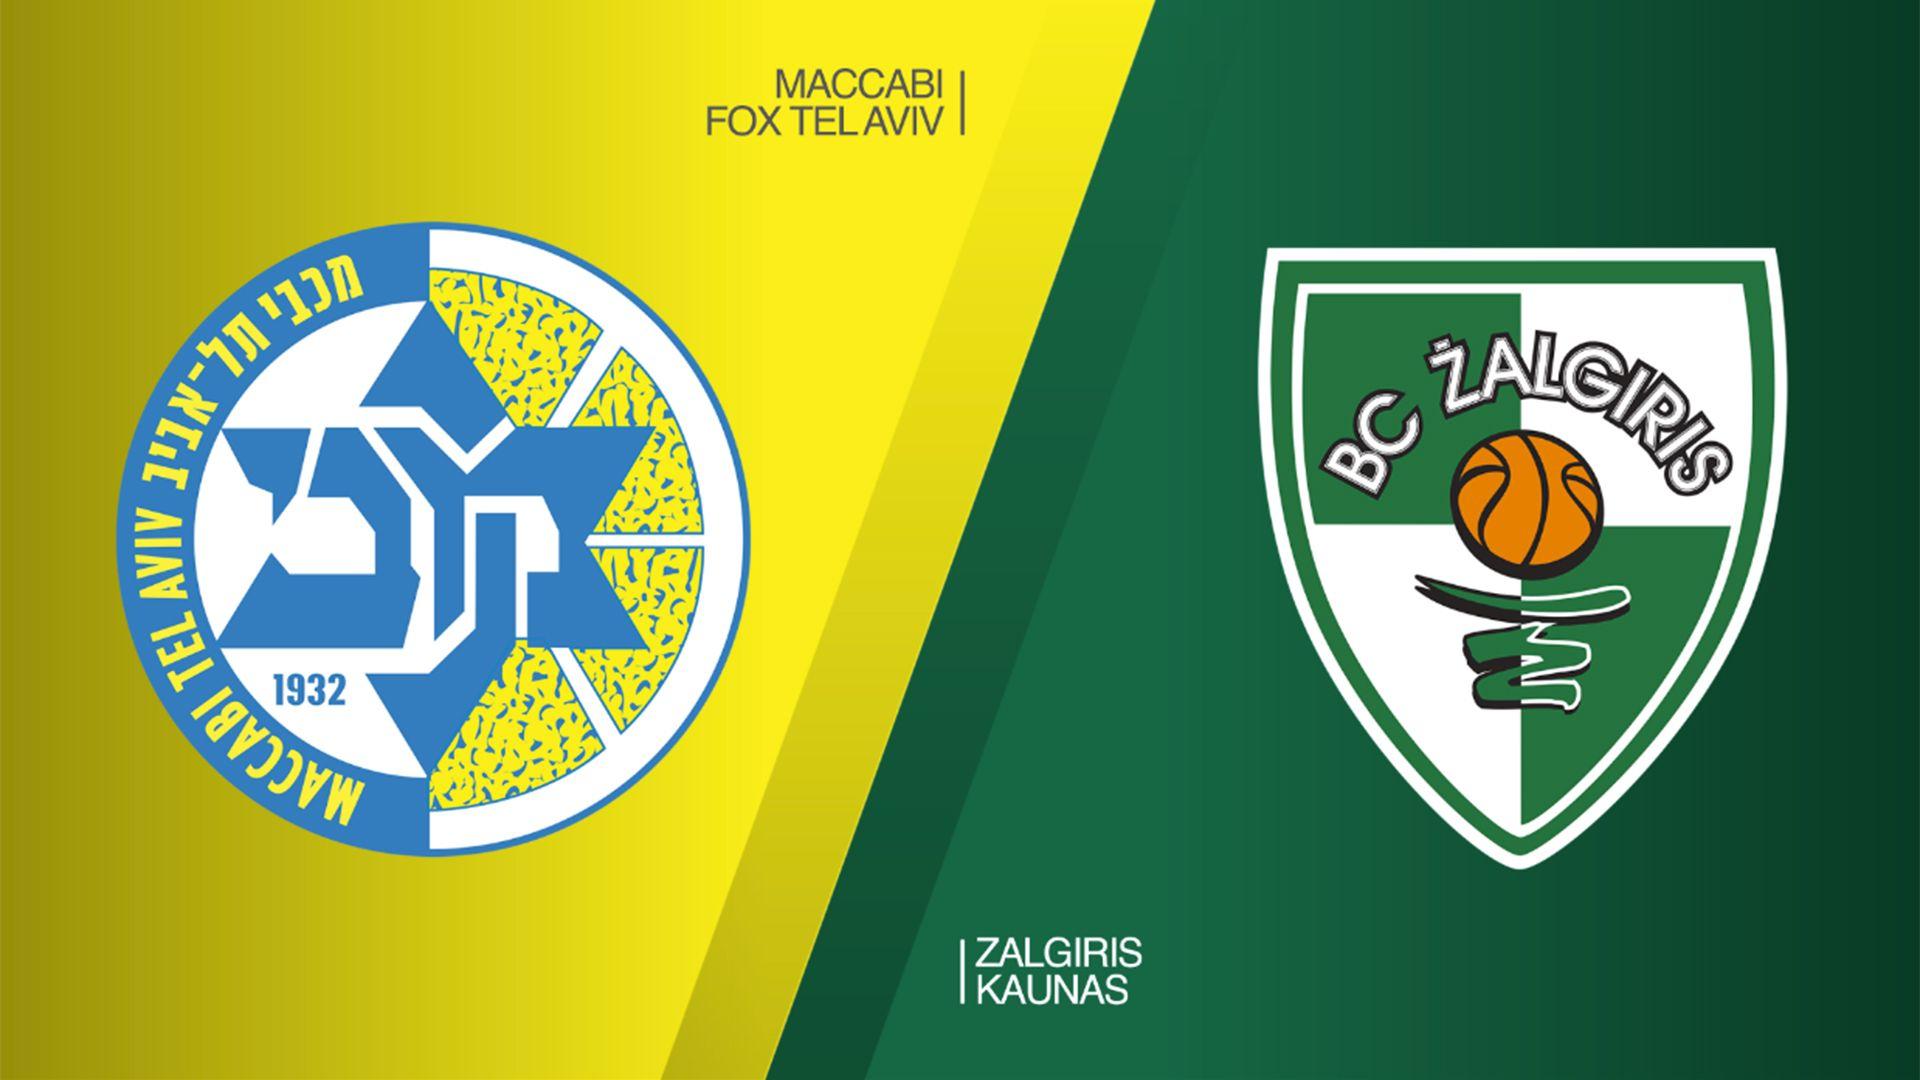 Maccabi FOX Tel Aviv Zalgiris Kaunas Highlights